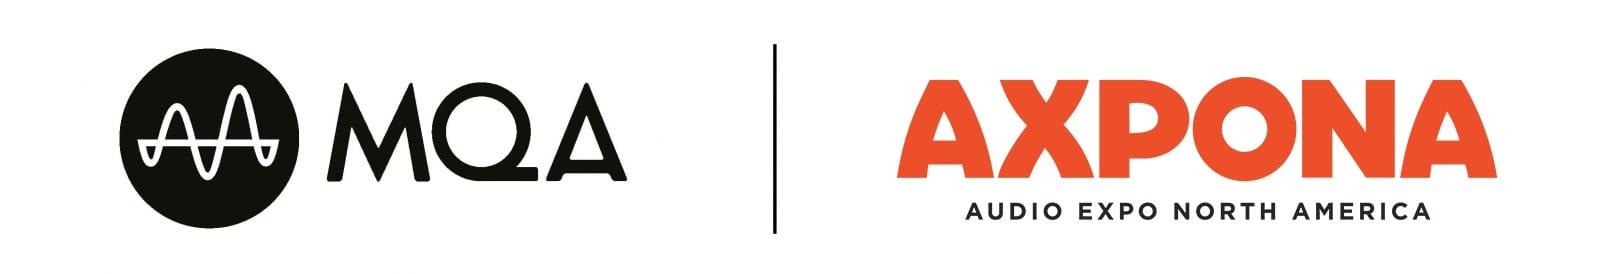 MQA Champions Master Quality Sound at AXPONA 2019